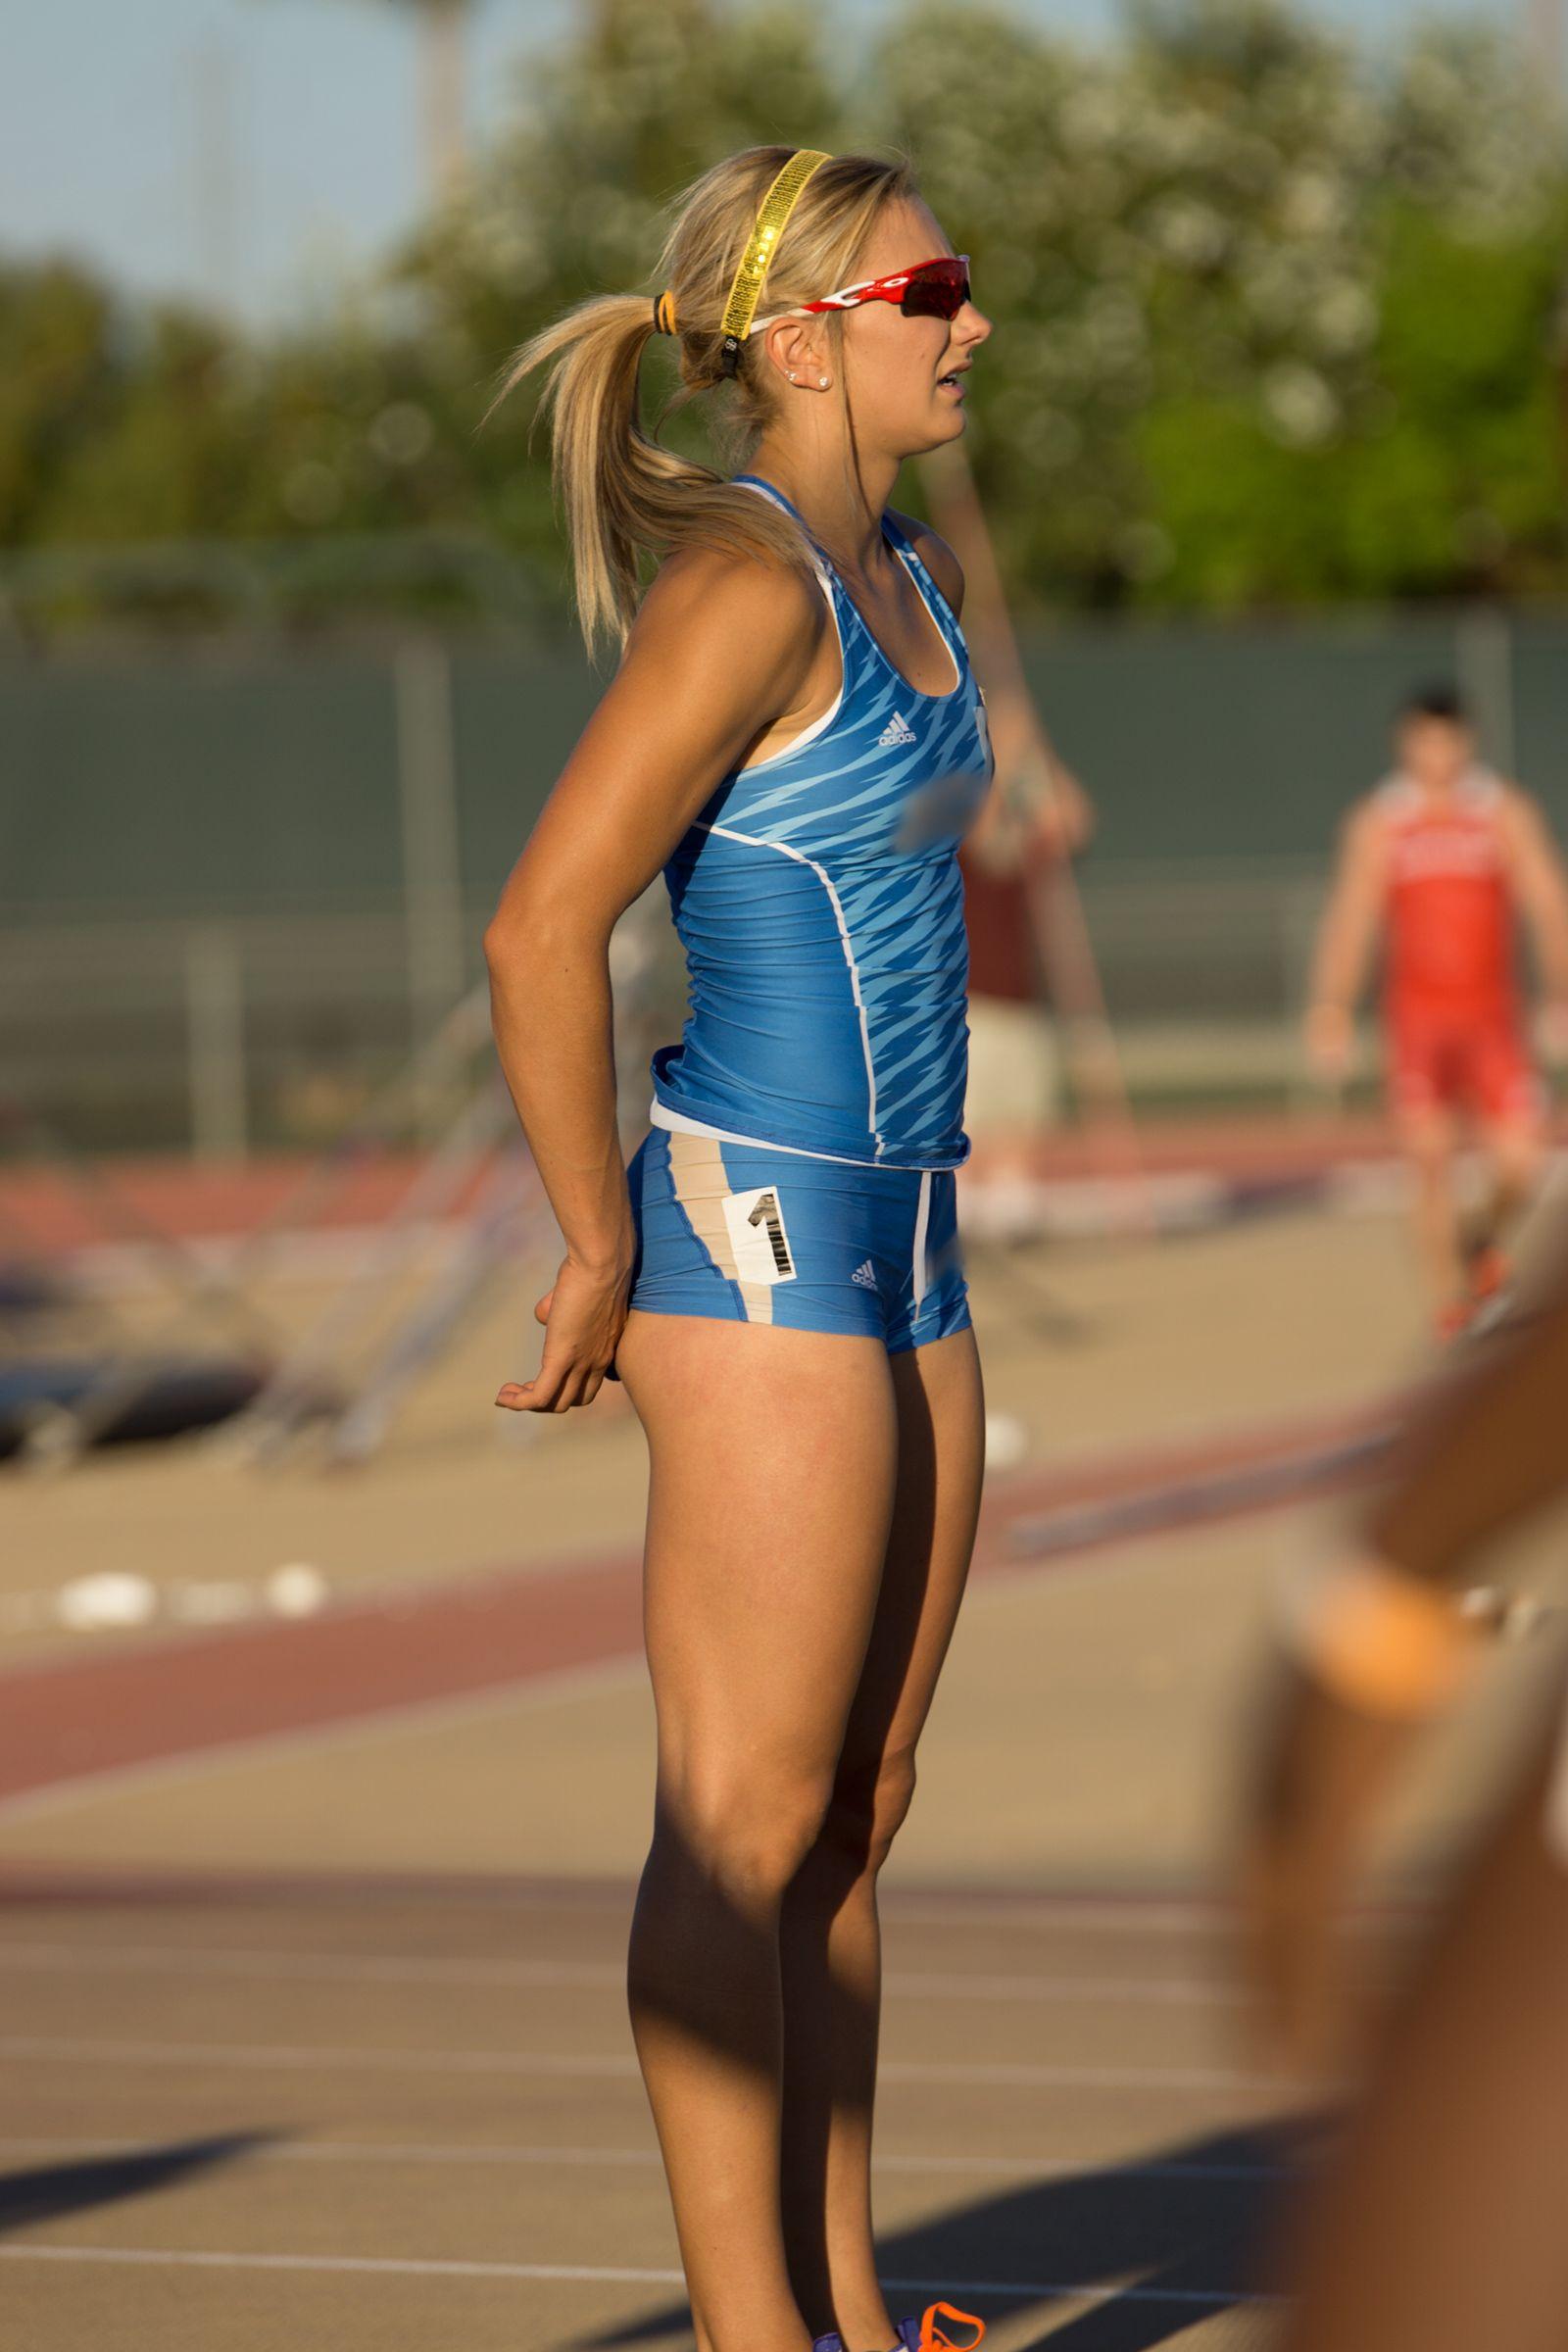 Yoga Pants Candid 6 U0876 Hot Girl Hd Wallpaper   CLOUDY GIRL ...